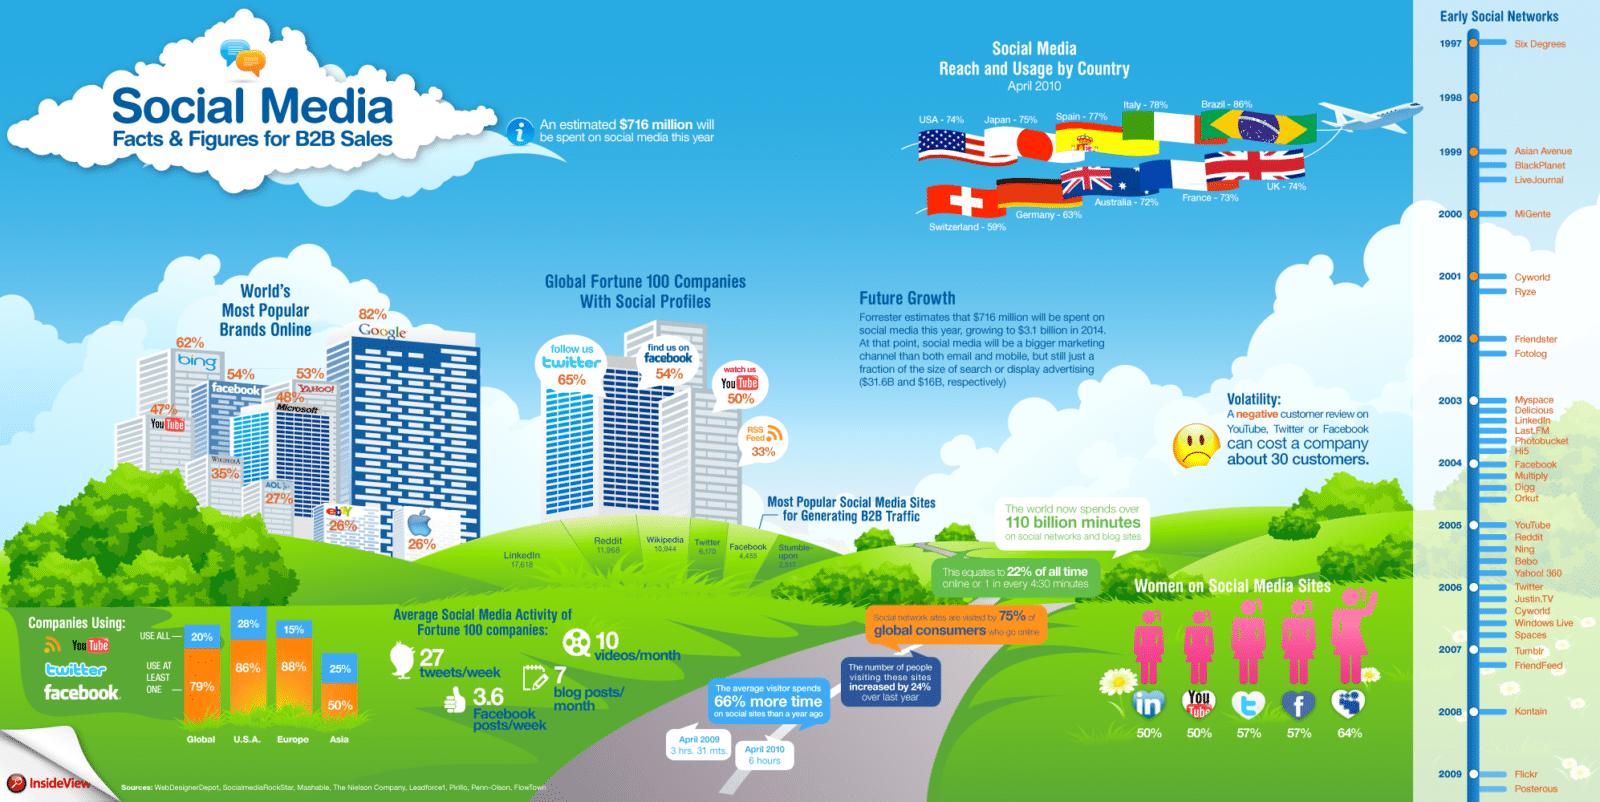 Social Media Infographic for B2B Sales